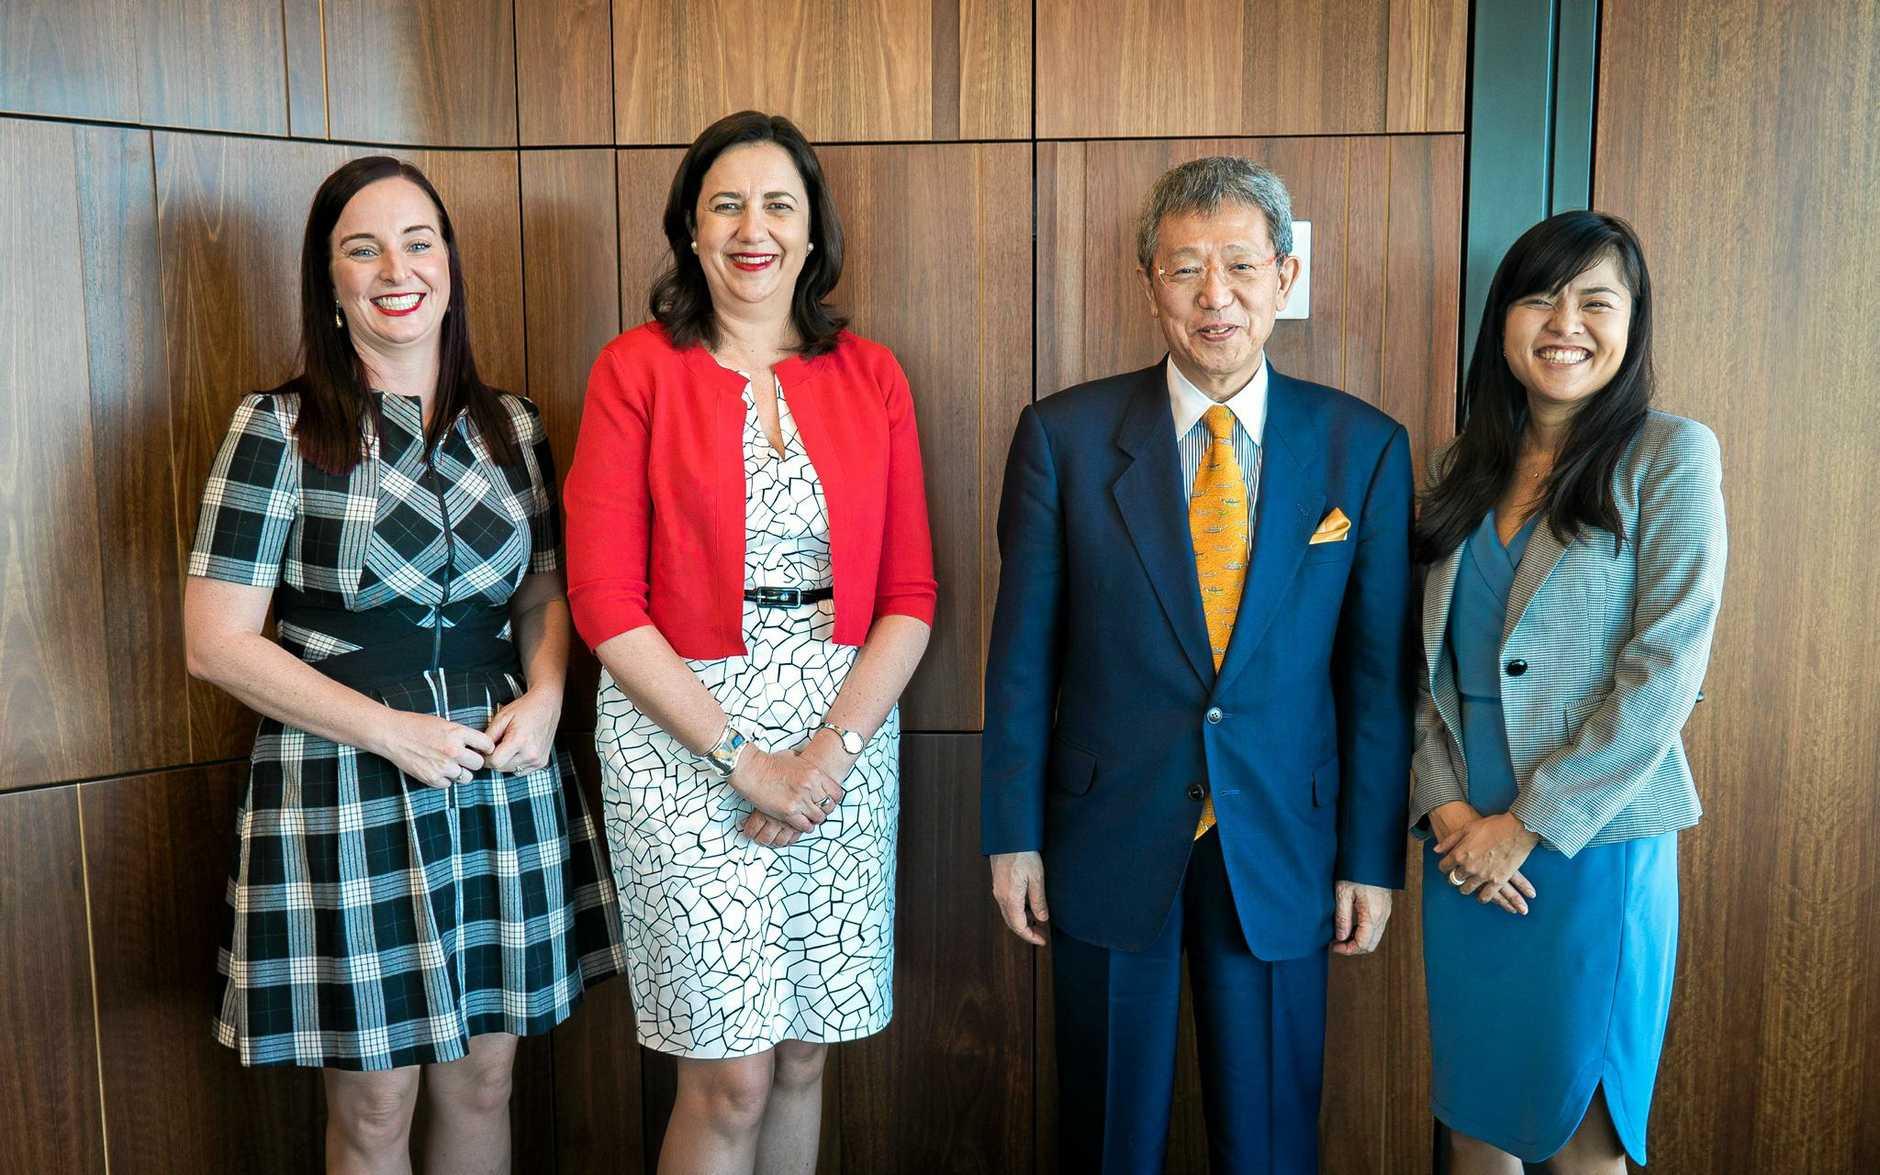 Member for Keppel Brittany Lauga and Premier Annastacia Palaszczuk met with Iwasaki Sangyo President Mr Yoshitaro Iwasaki and International Sales and Marketing Manager Ms Takaho Iwasaki in Brisbane today.